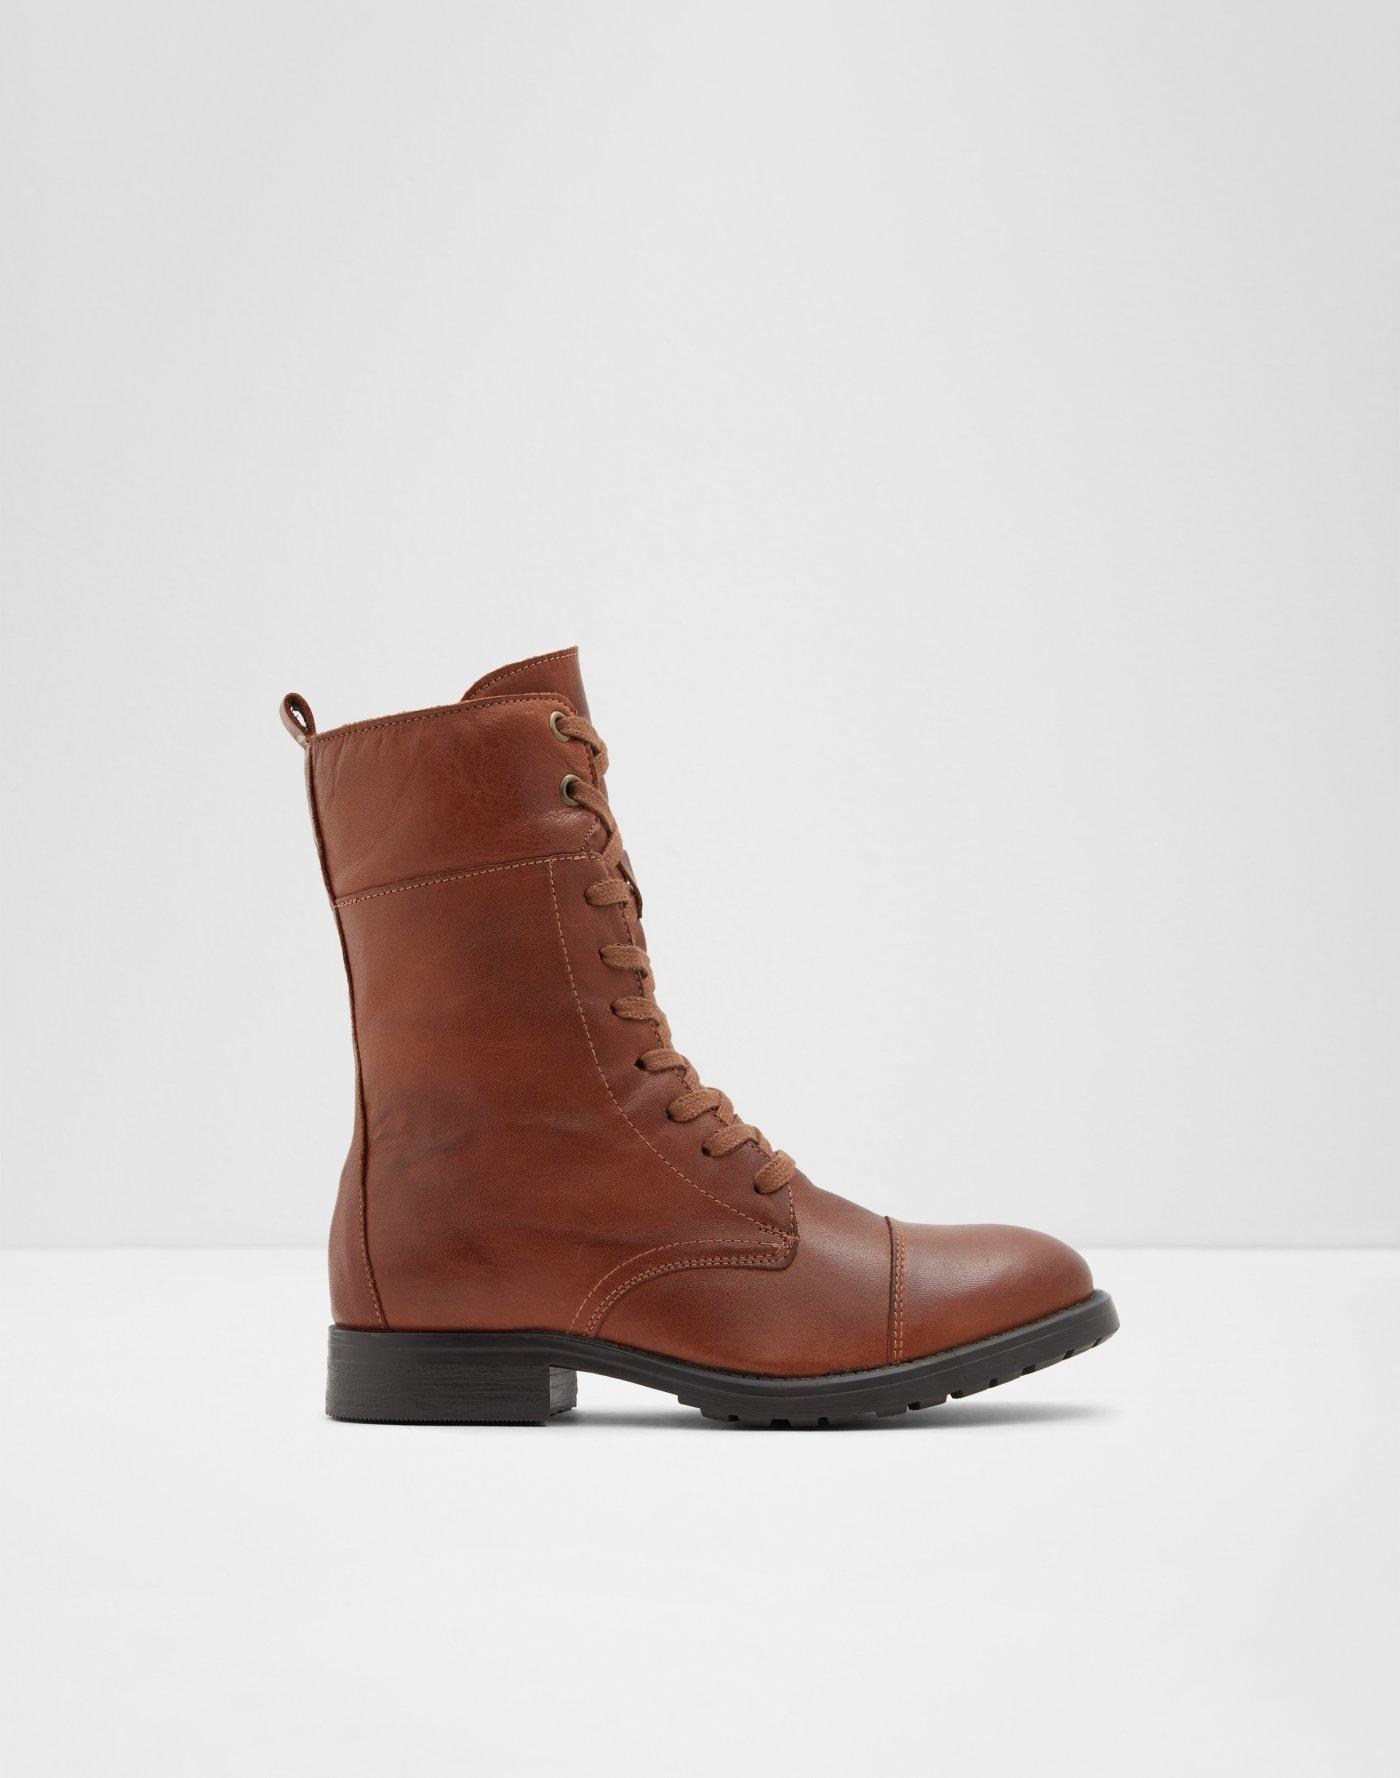 ee169449bc3ef6 Women's Clearance Sales | Shoe Clearance | ALDO Canada | ALDO Canada